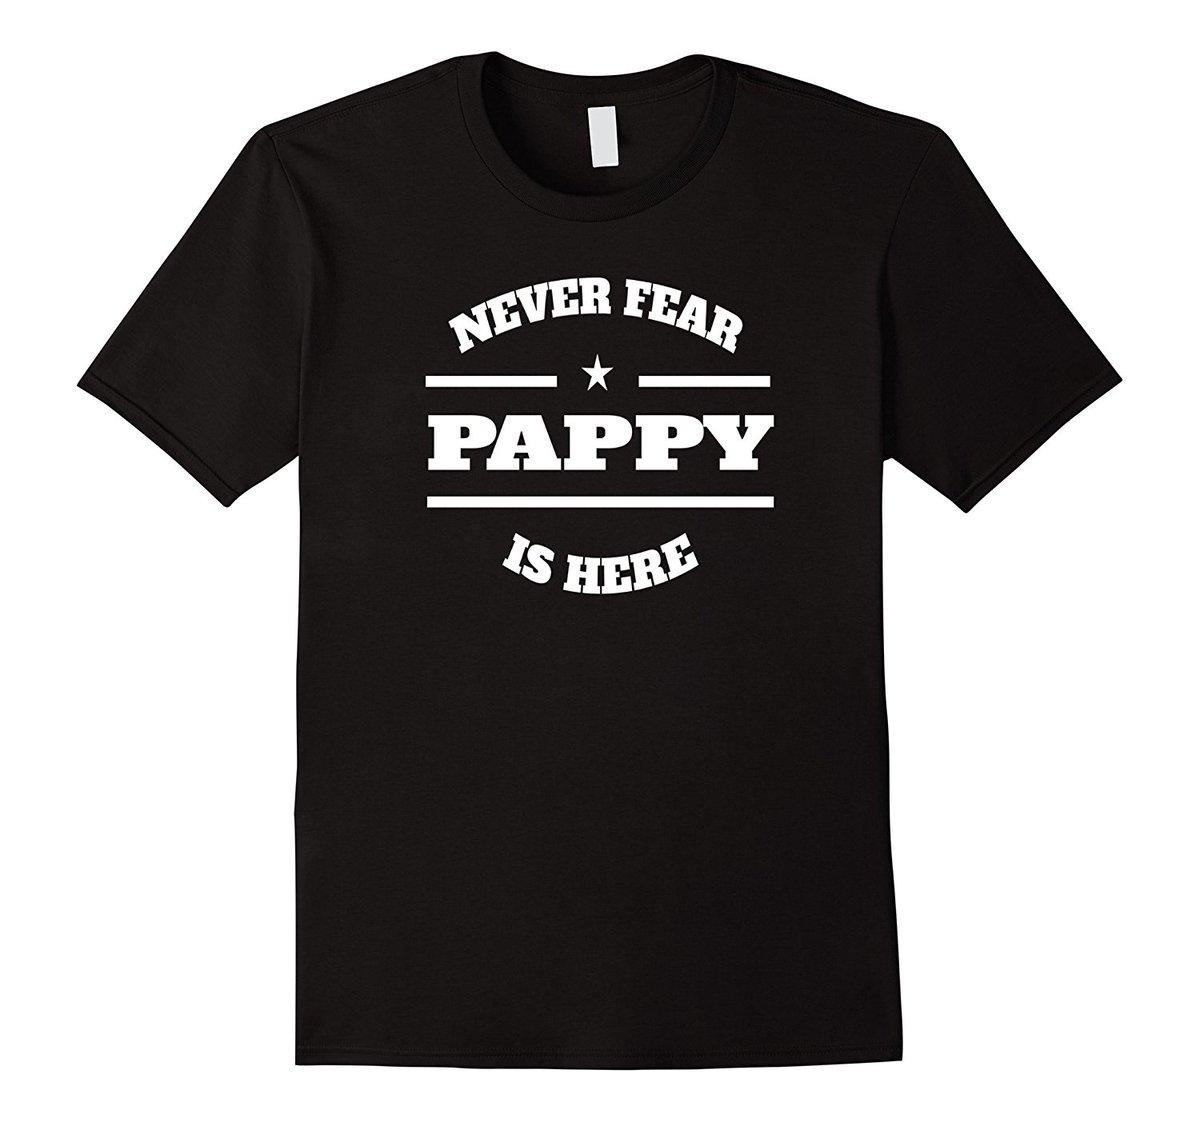 #Pappy Gift T-Shirt - #GrandparentsDay - Never Fear https://t.co/w4aJj5CmuI # https://t.co/wsZGy3wexp